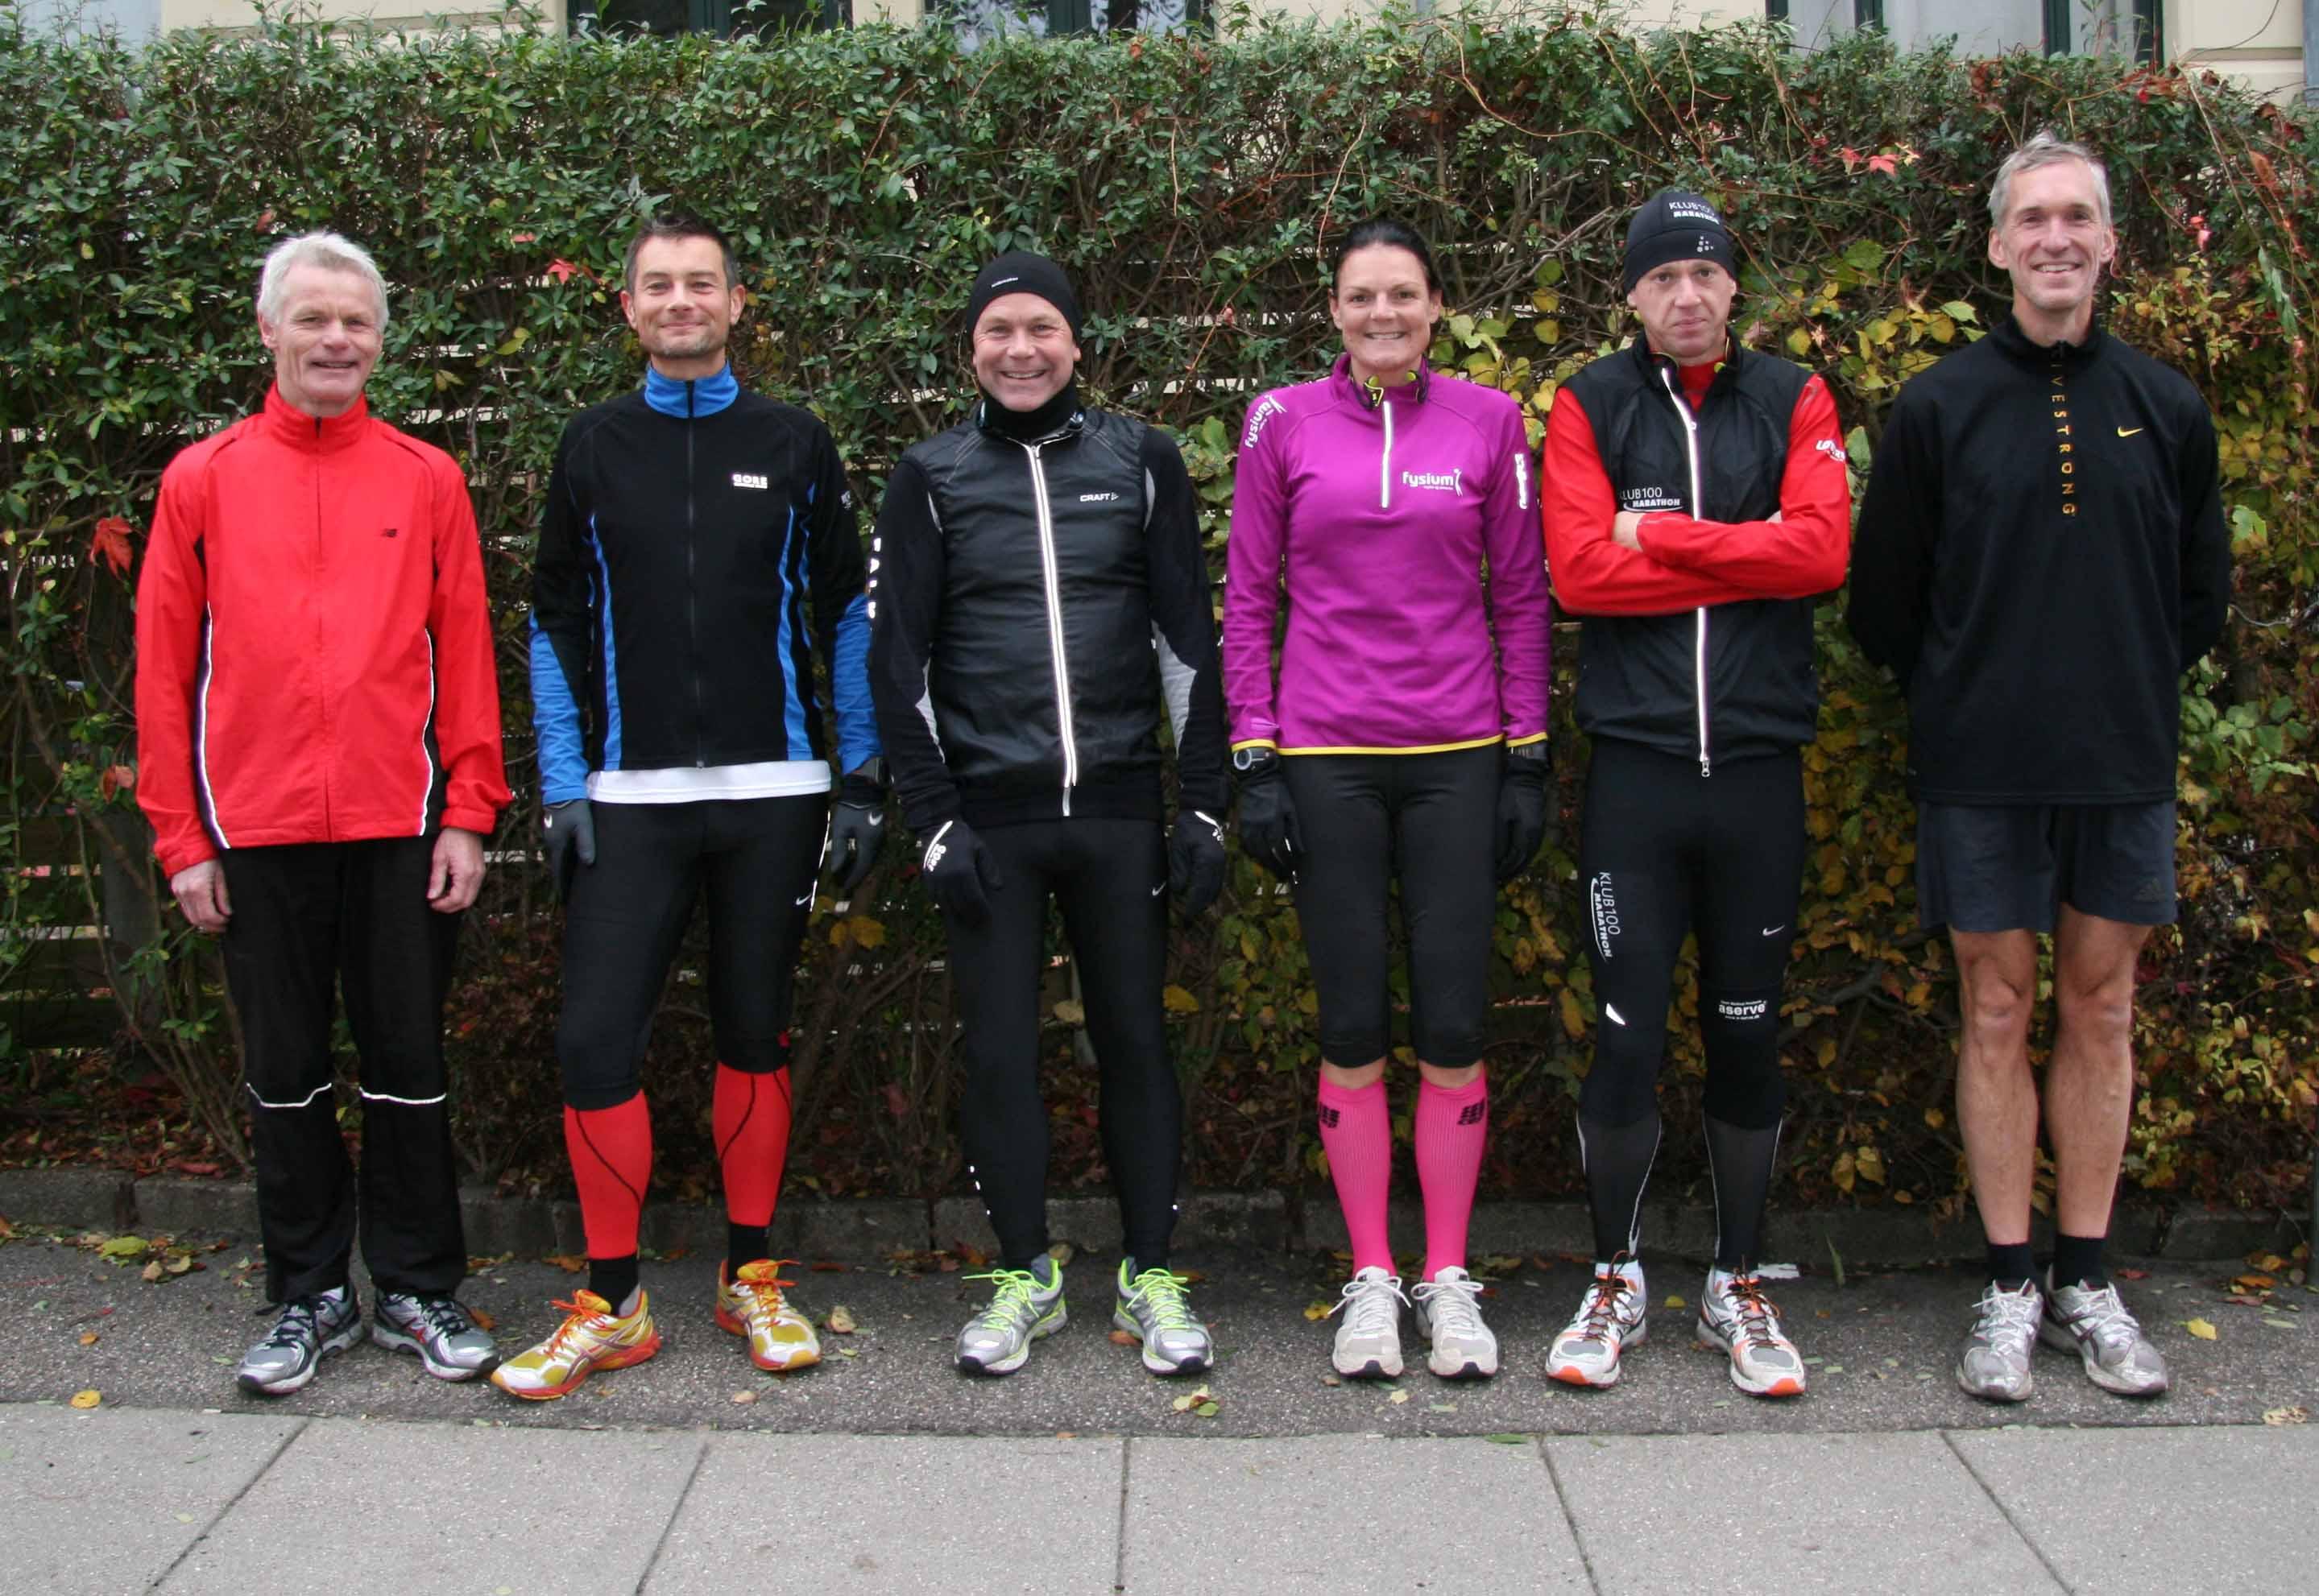 Endnu engang klar til Fredskov Marathon i København - Alle gengangere på ruten. Preben Poulsen, Henrik Hoplarik Franijeur, Carsten Dahl, Annette Fredskov, Rene Hjorth Olsen, Jerk W. Langer